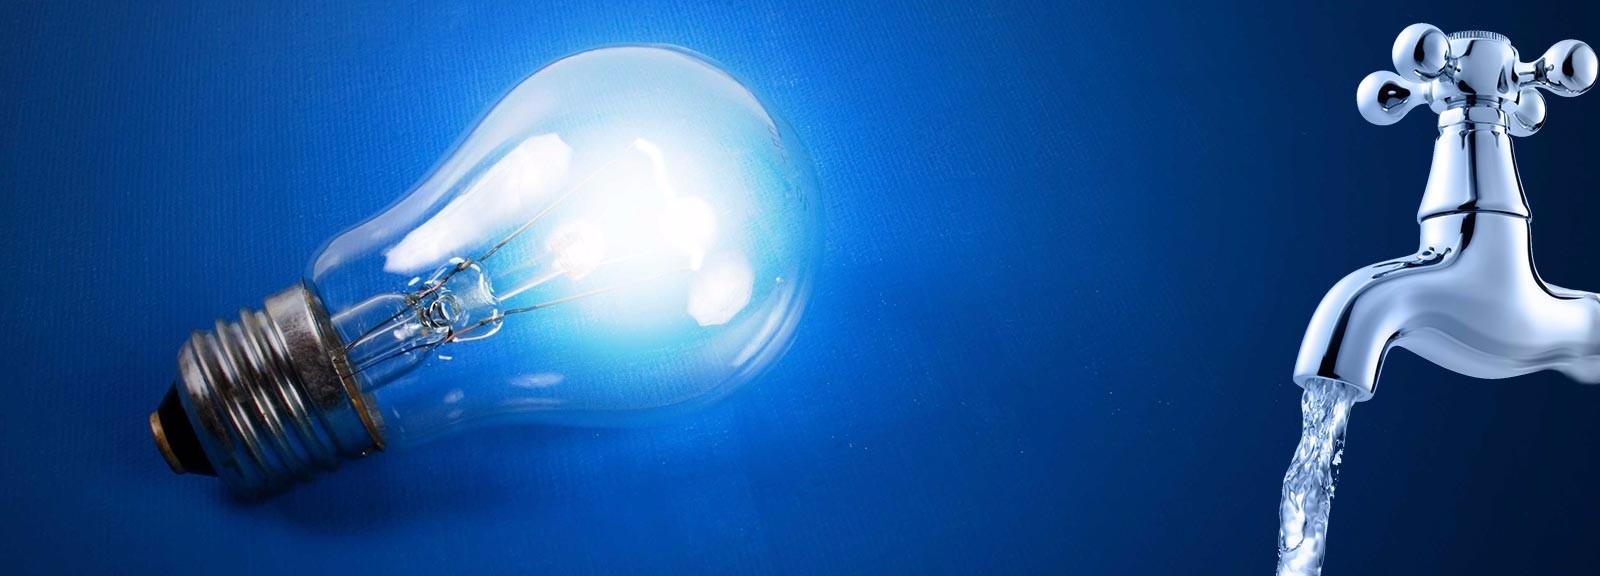 Propsocial property utilities application 1